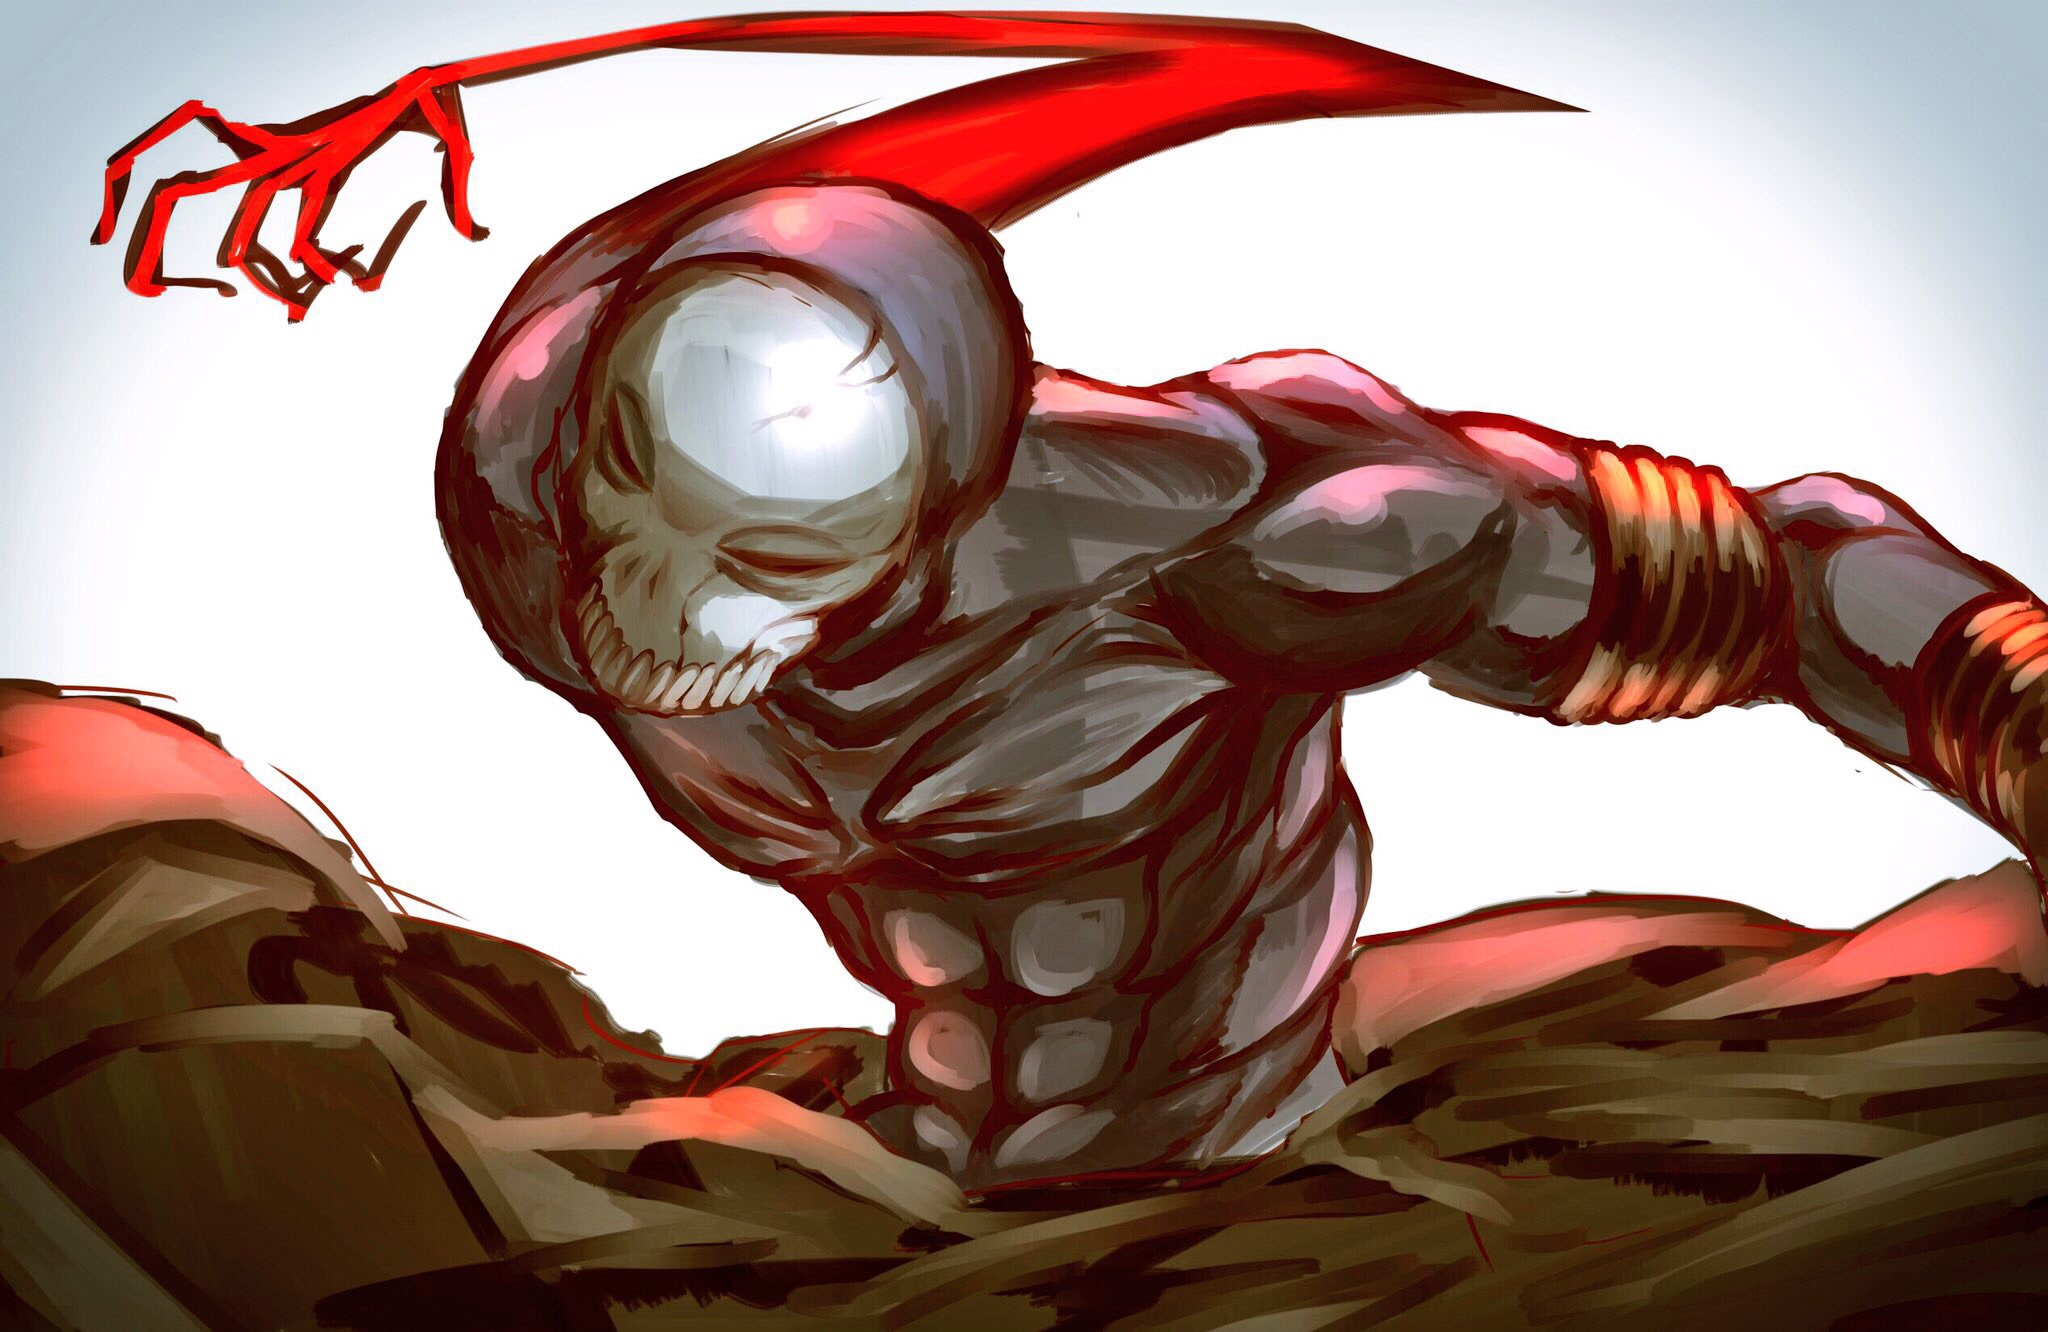 Cursed Arm Hassan 2048x1332